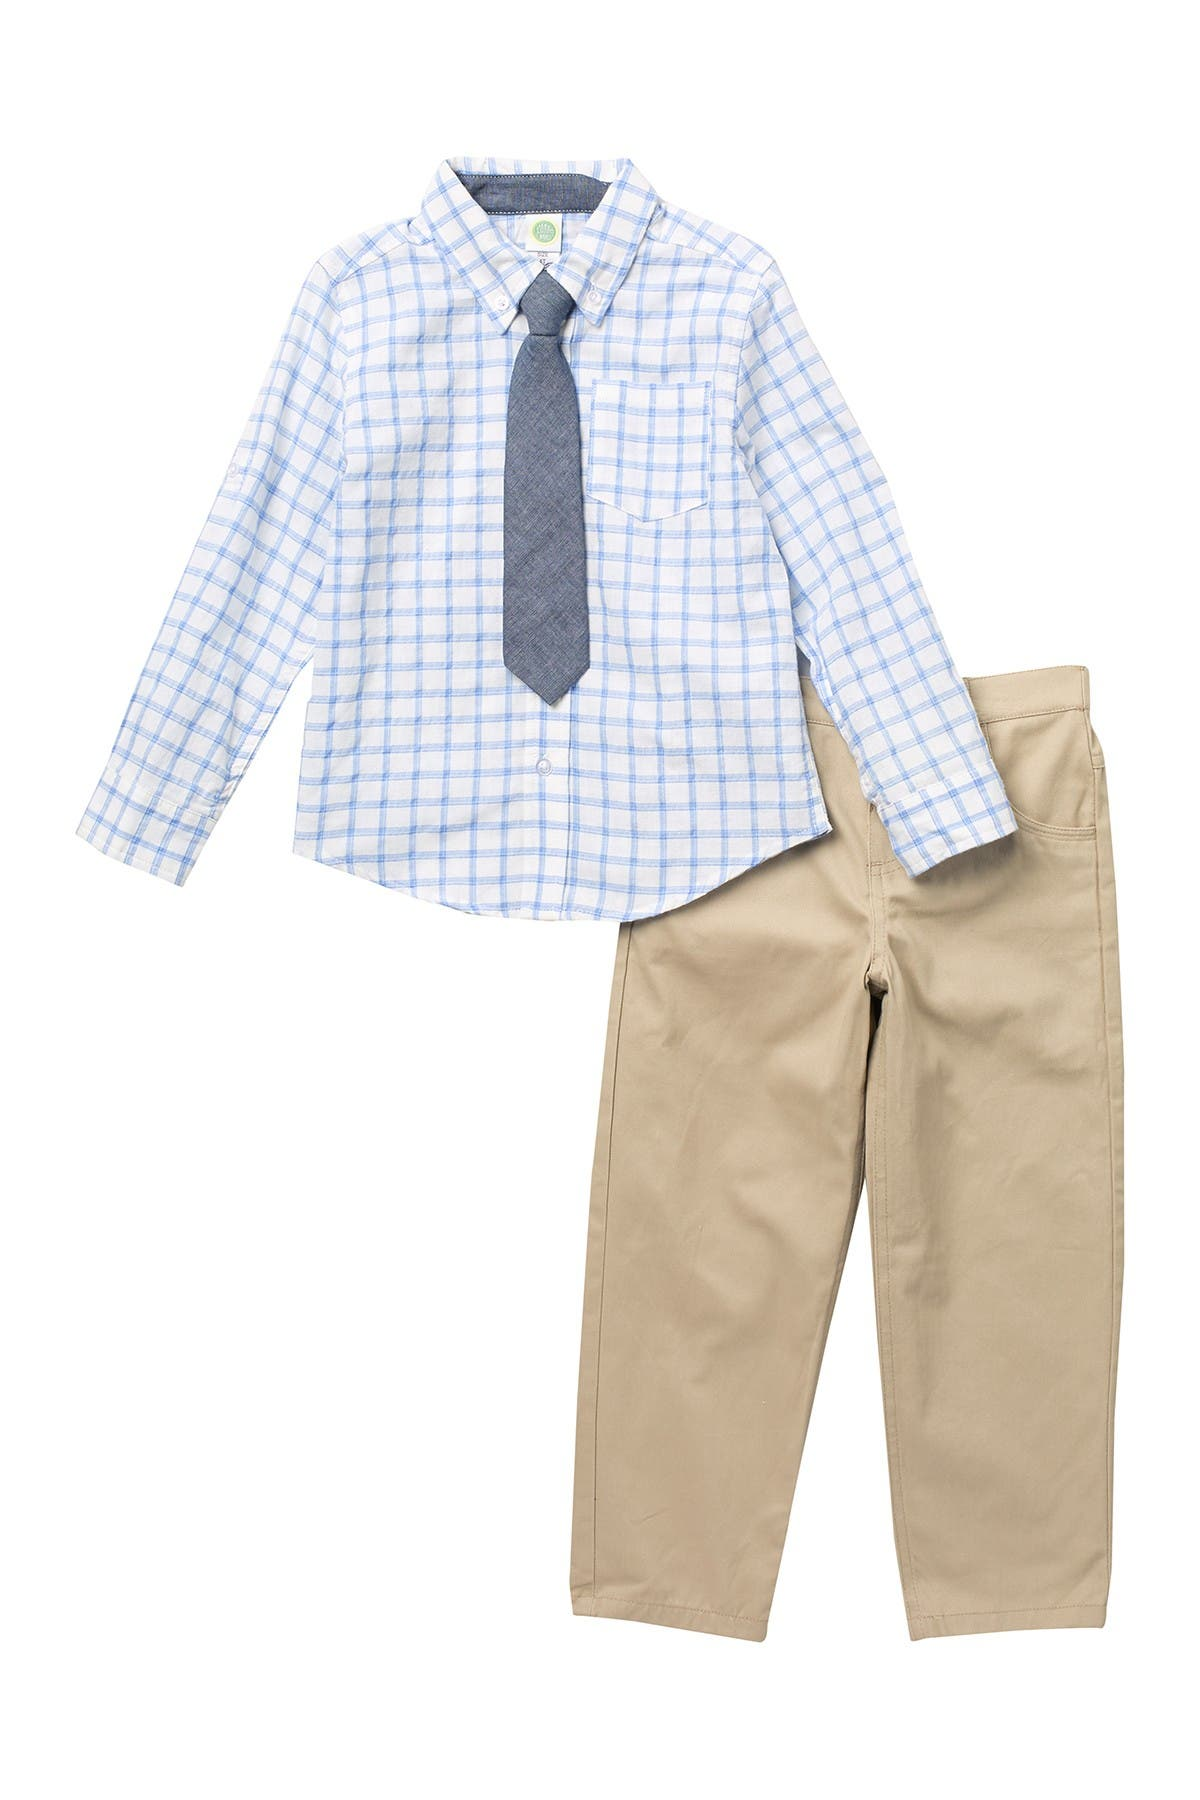 Image of Little Me Tattersall Woven Shirt & Pant Set